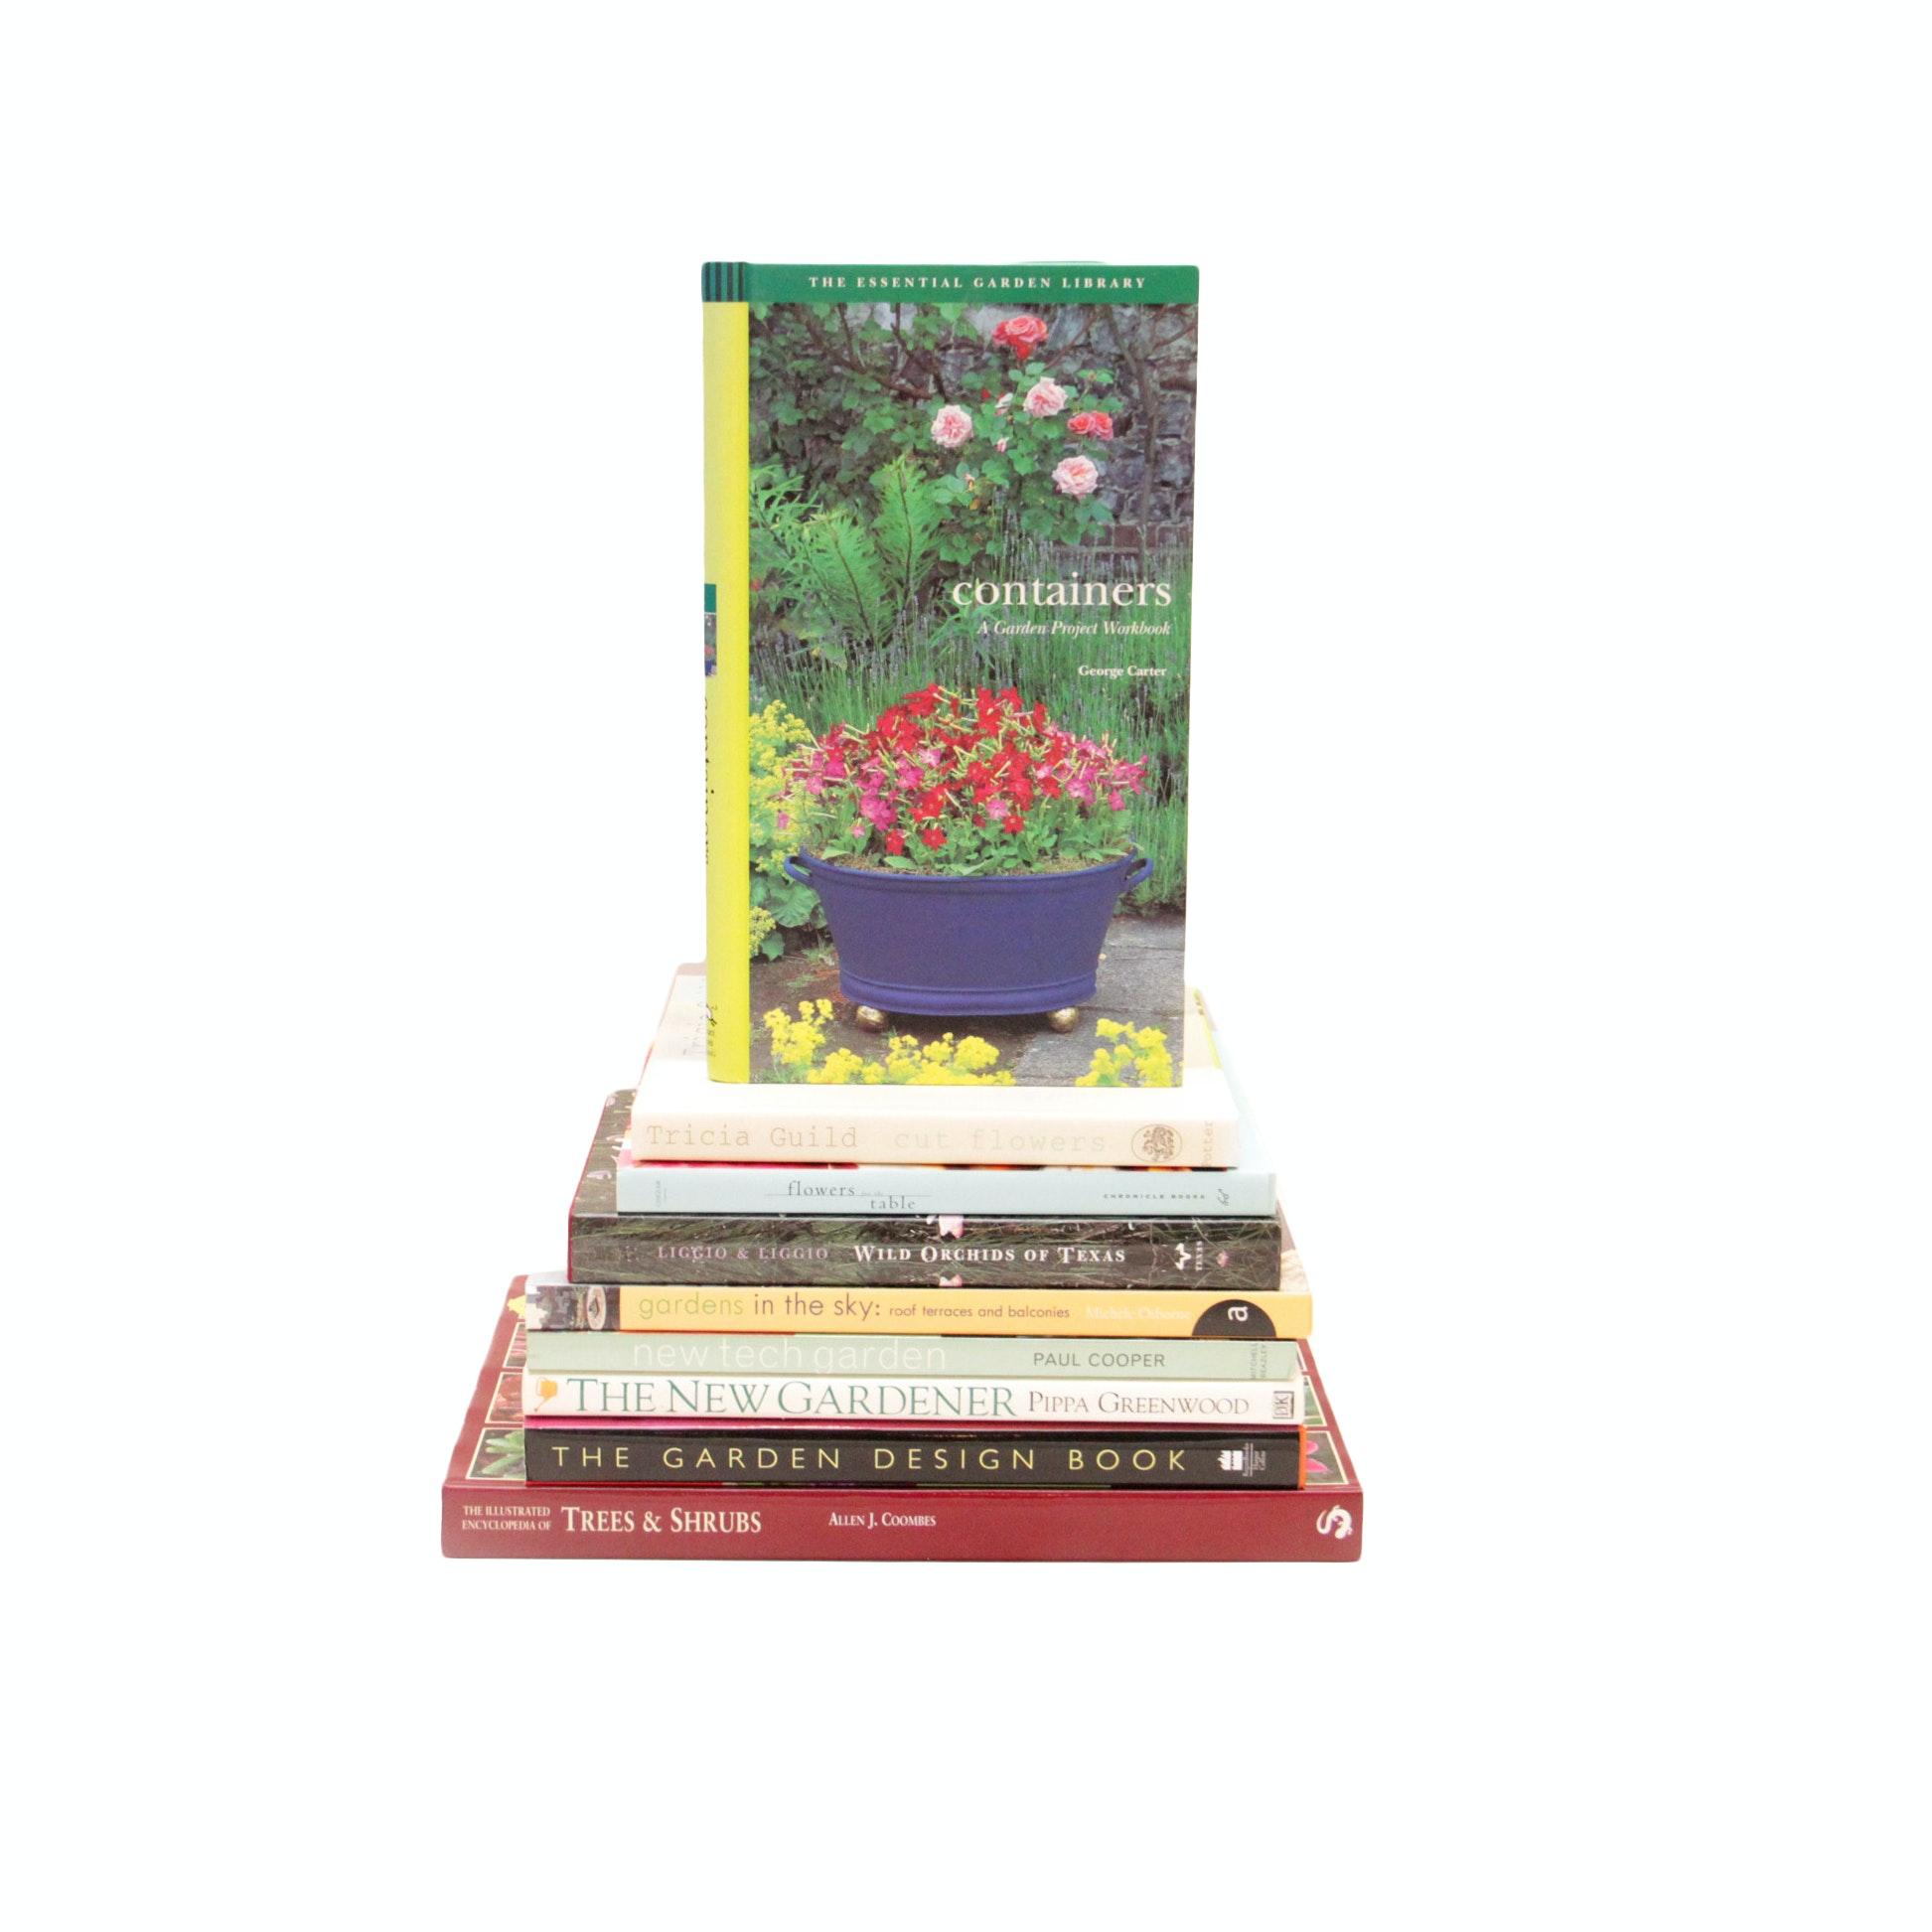 Collection of Garden Books